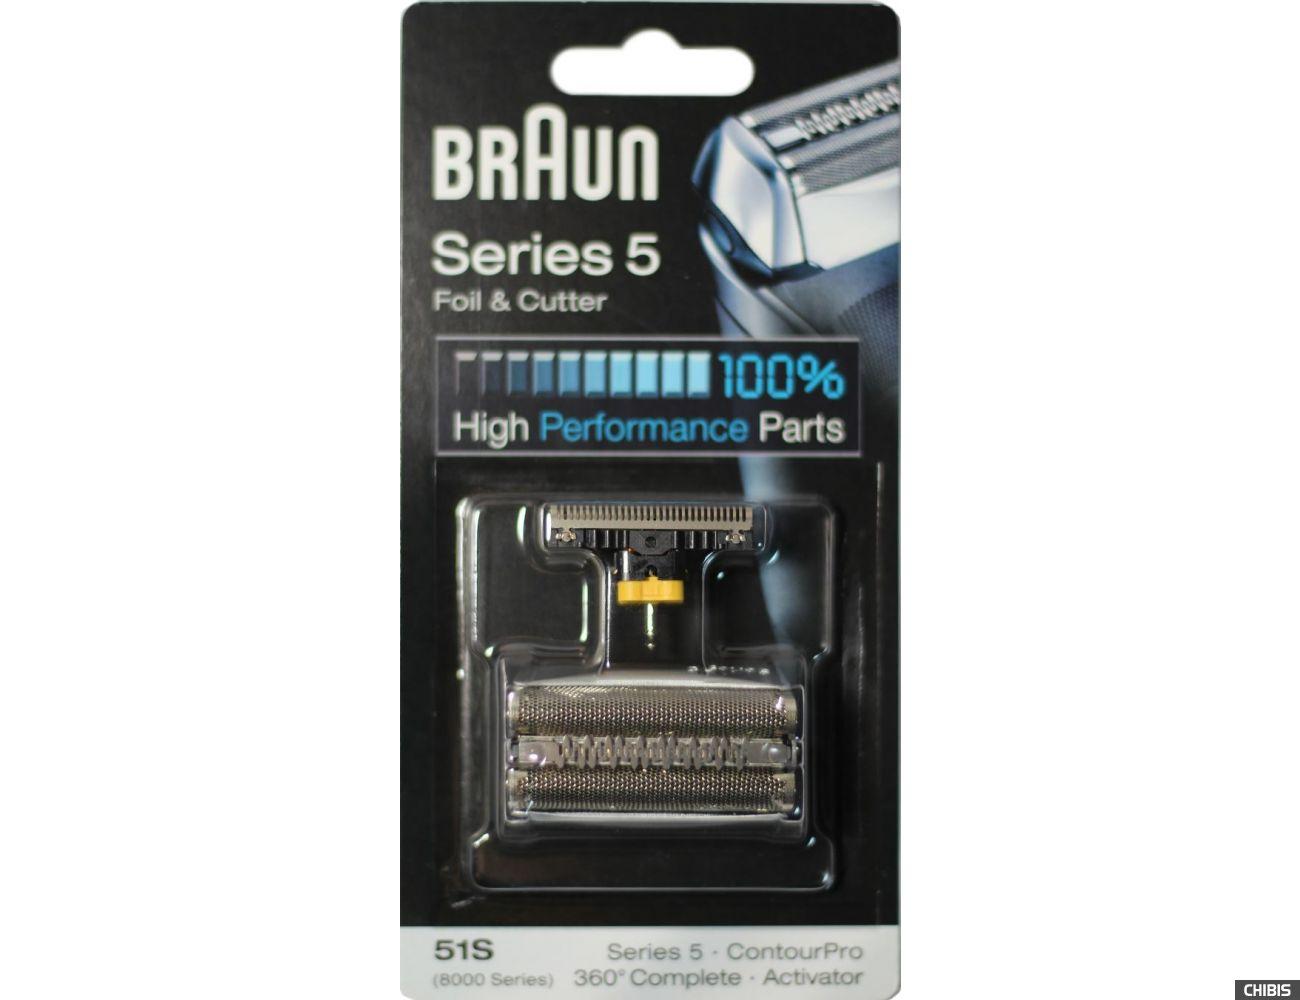 Сетка Braun 51s серии 8000 Активатор комплект сетка + нож оригинал Германия